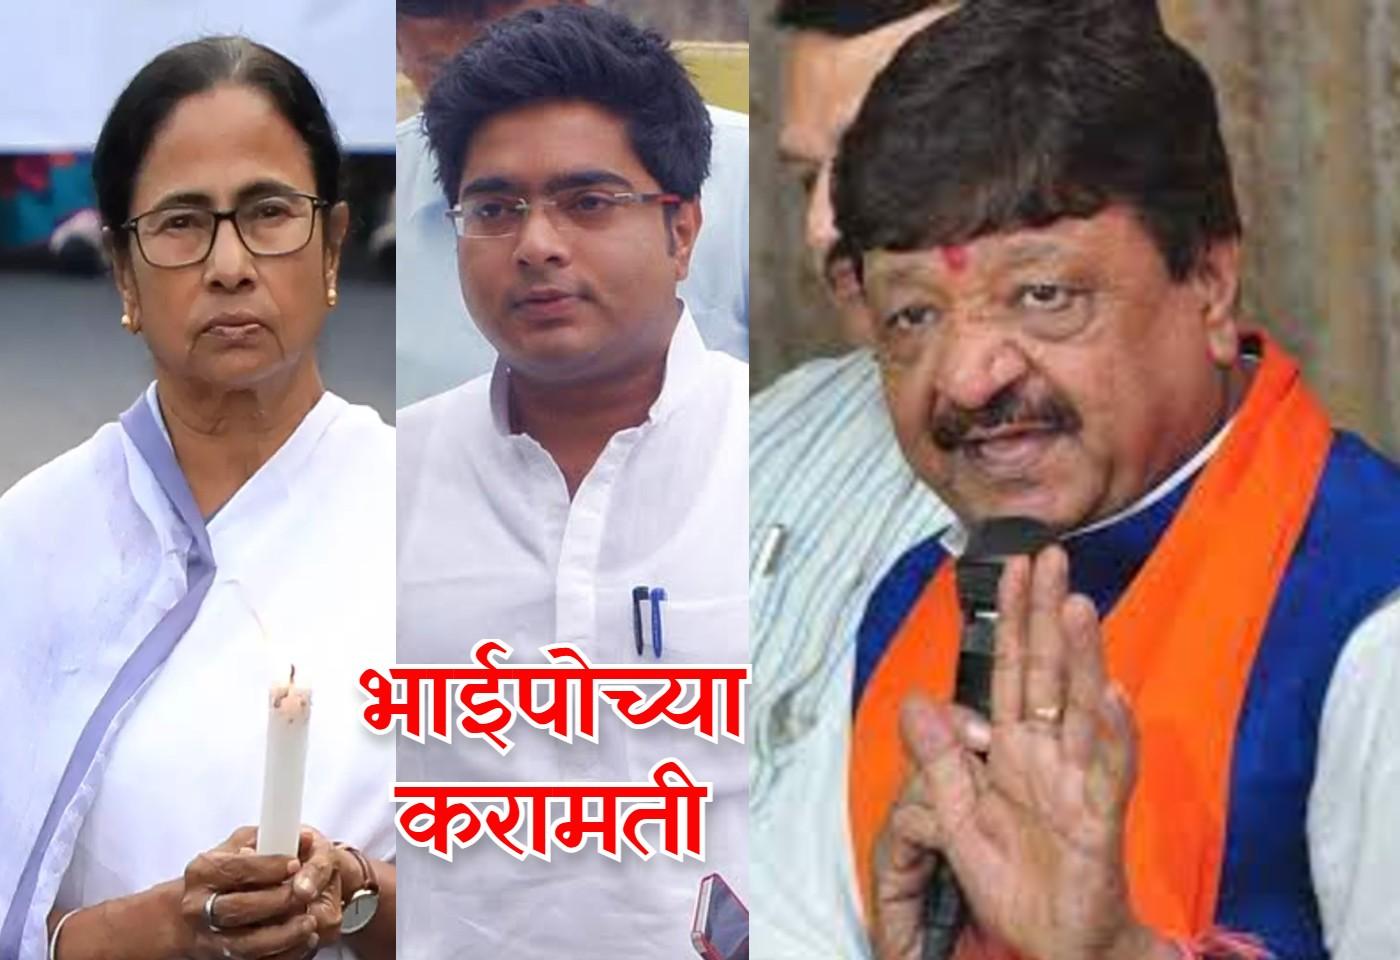 Corruption culminates in Mamata's rule, reveals Kailash Vijayvargiya